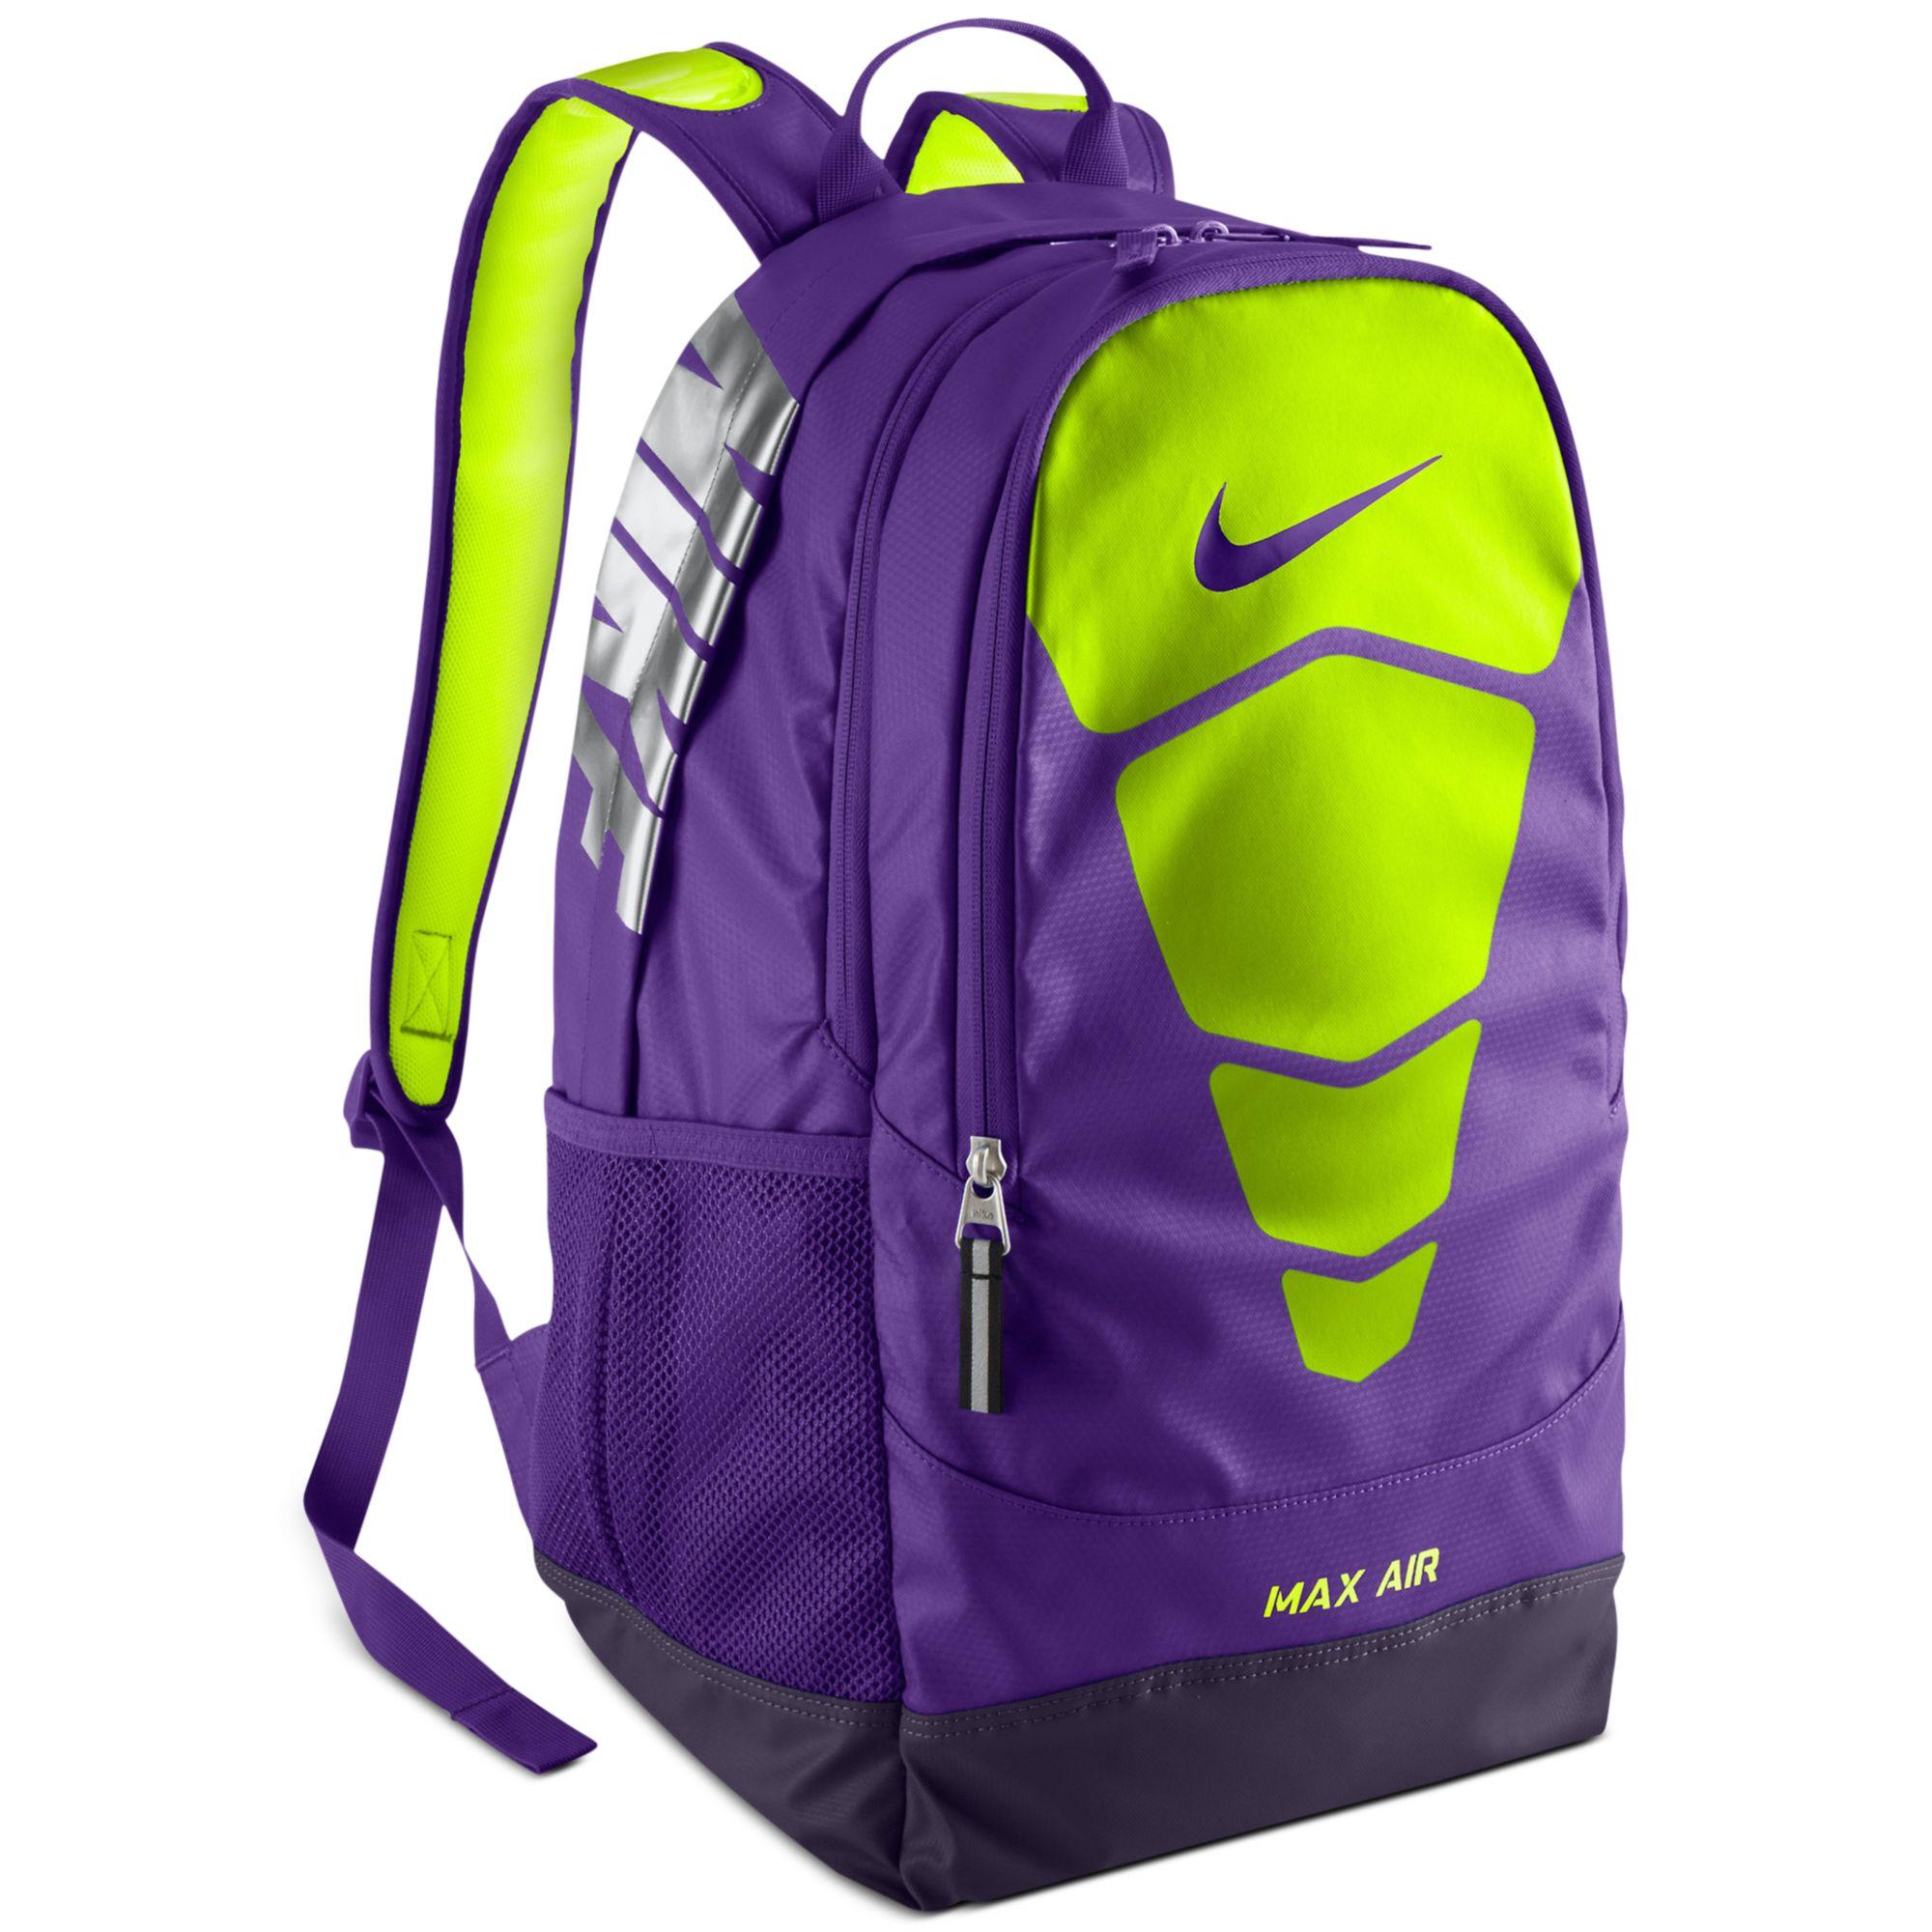 42d818a4497526 Nike Vapor Max Backpack Red- Fenix Toulouse Handball